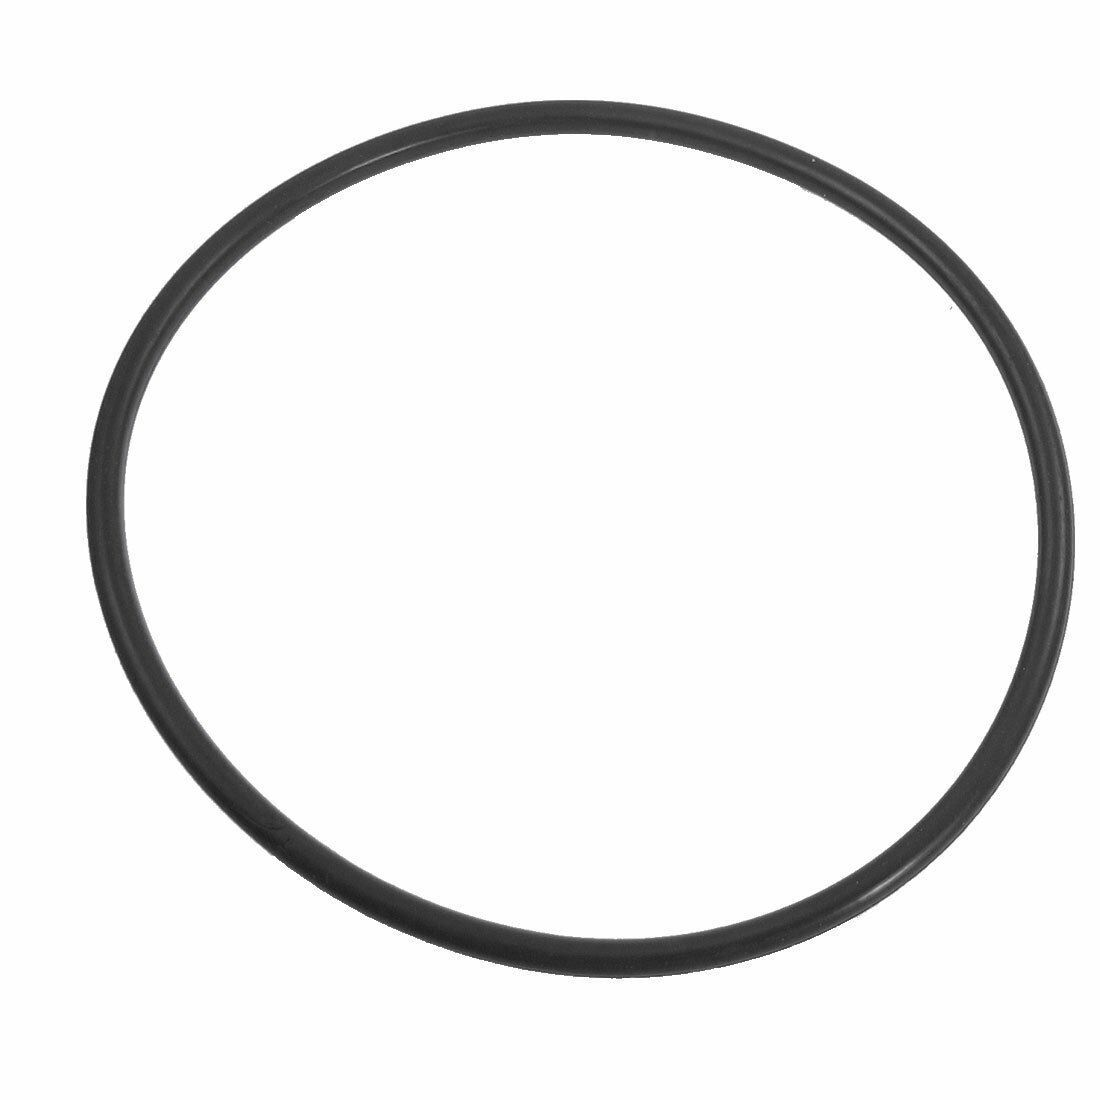 Black Rubber 105mm X 4mm Industrial Filter O Ring Seal | eBay